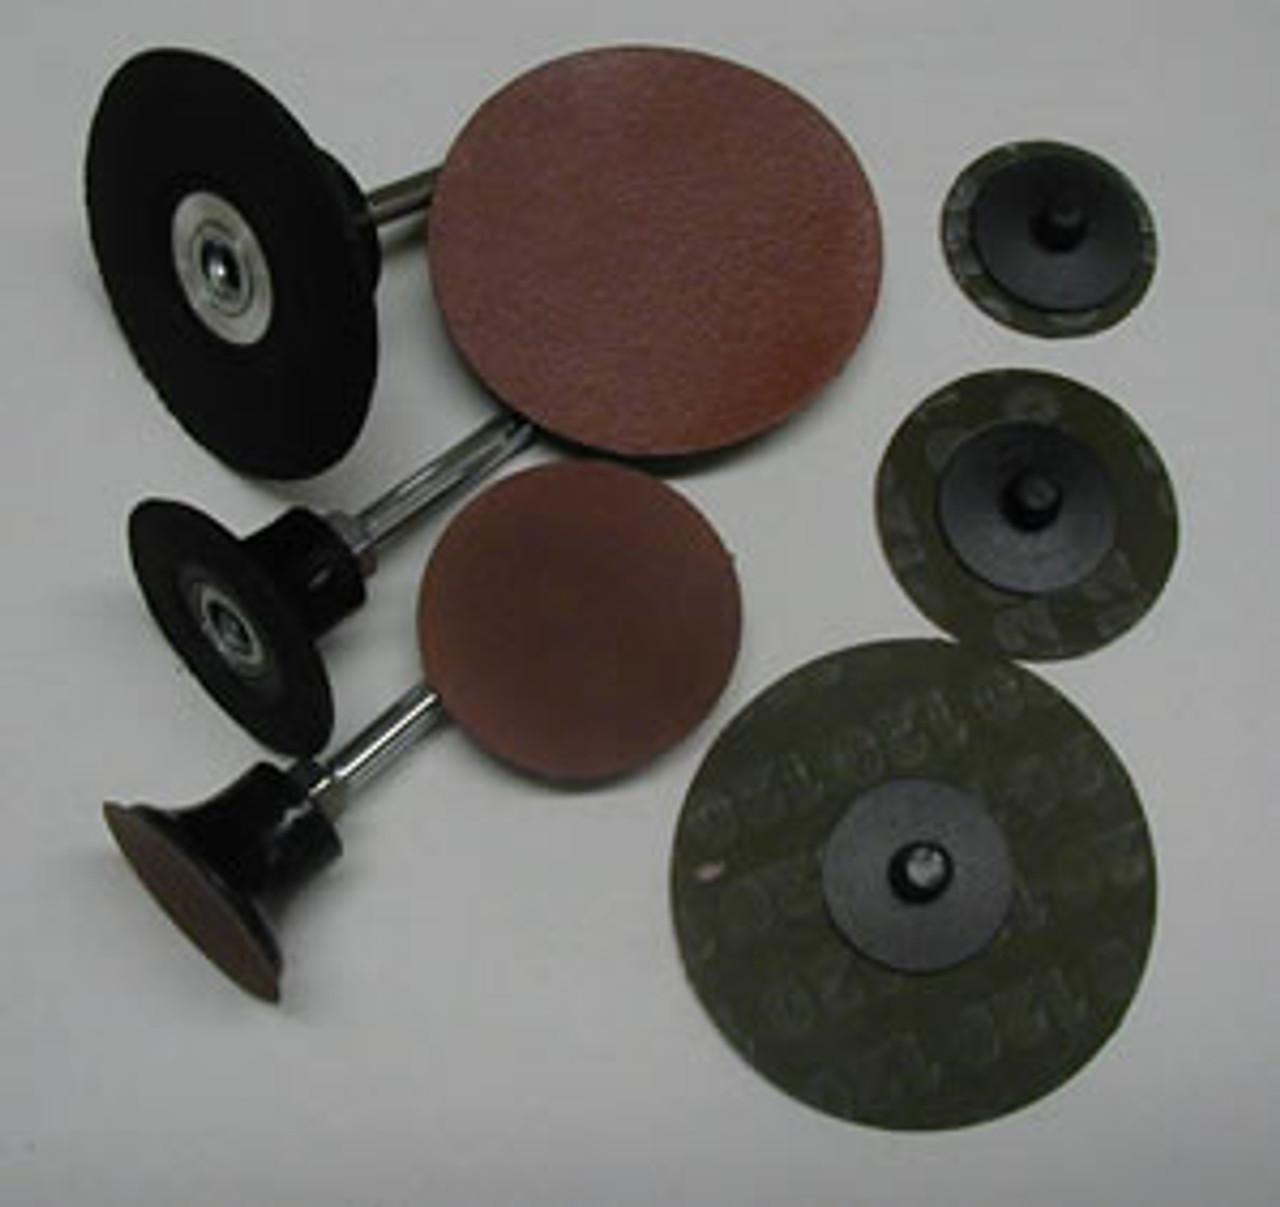 "Aluminum Oxide Sanding Disk 1.5"" - 120 Grit"